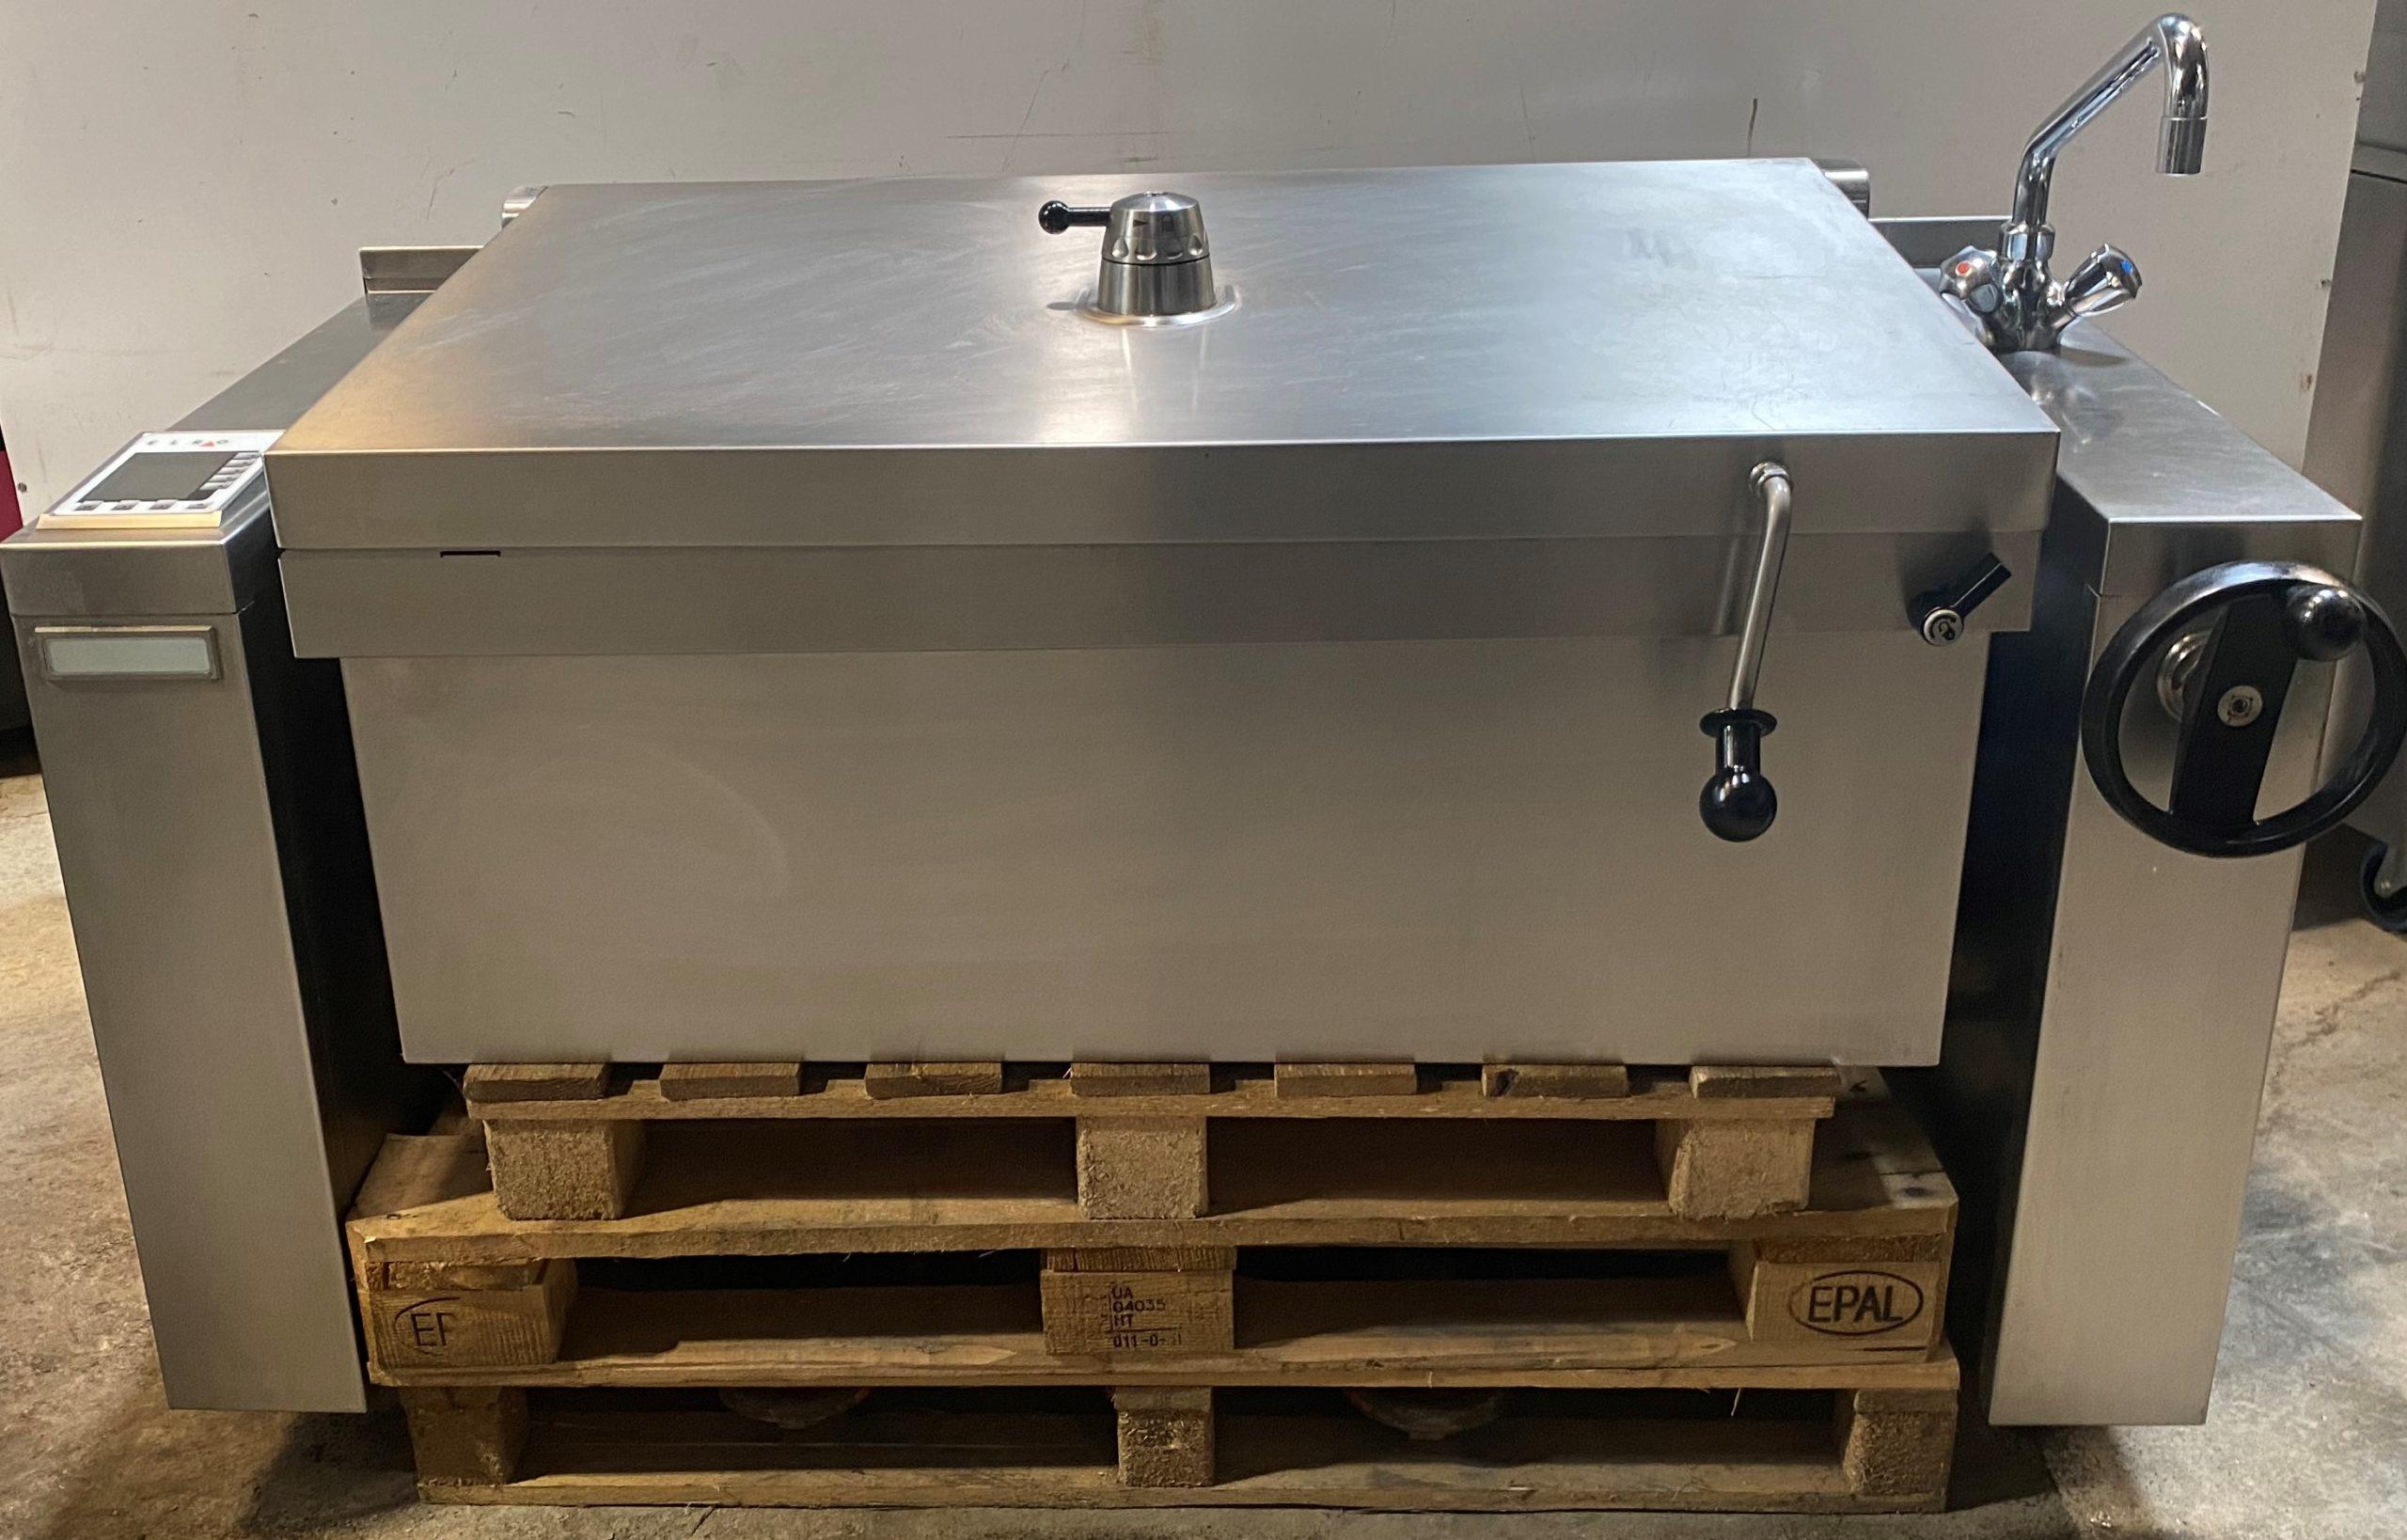 ELRO DBK GN 33 Pressurised 170 Litre Bratt Pan